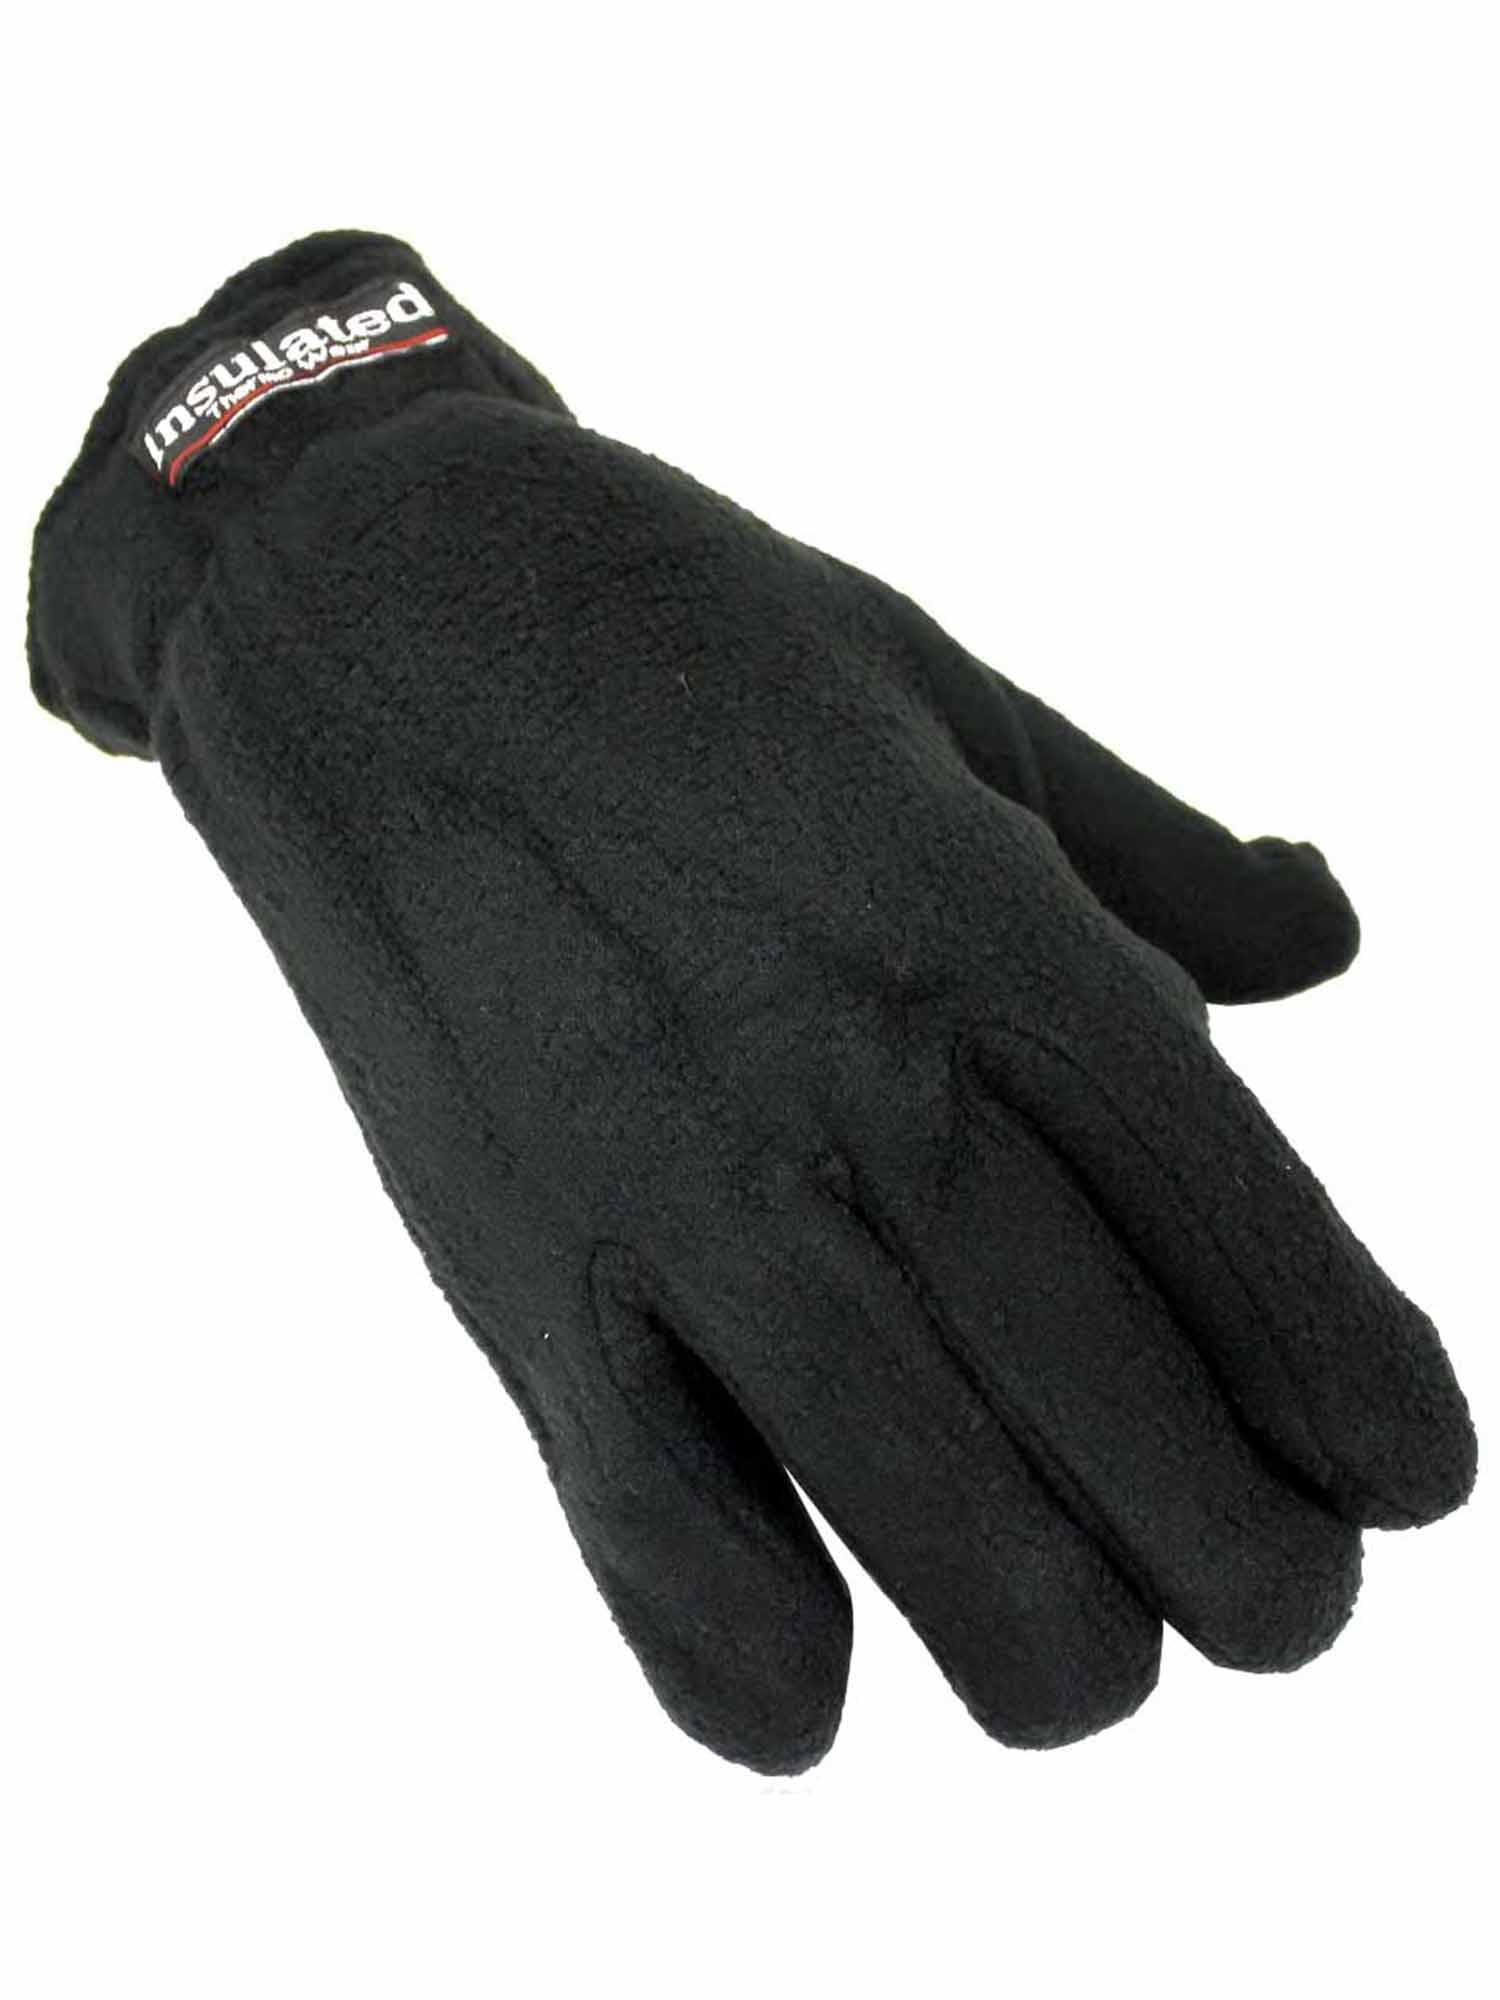 Womens Fleece Thermal Insulated Winter Gloves Walmart Com